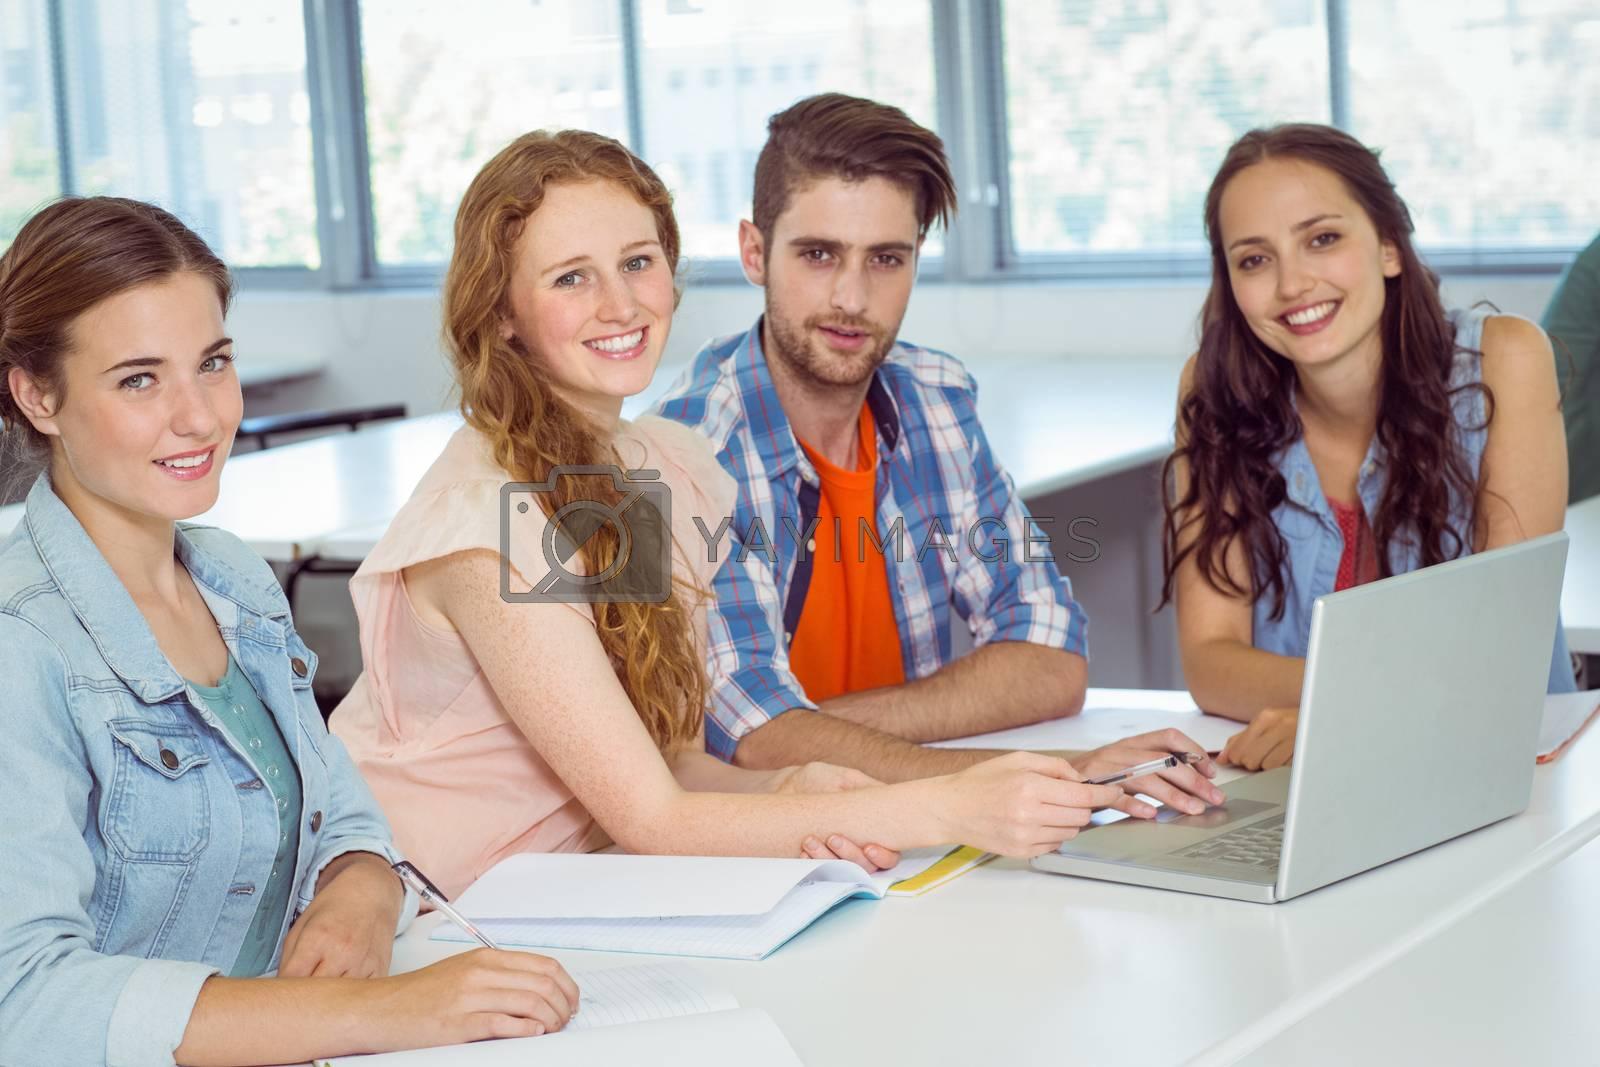 Fashion students looking at camera at college